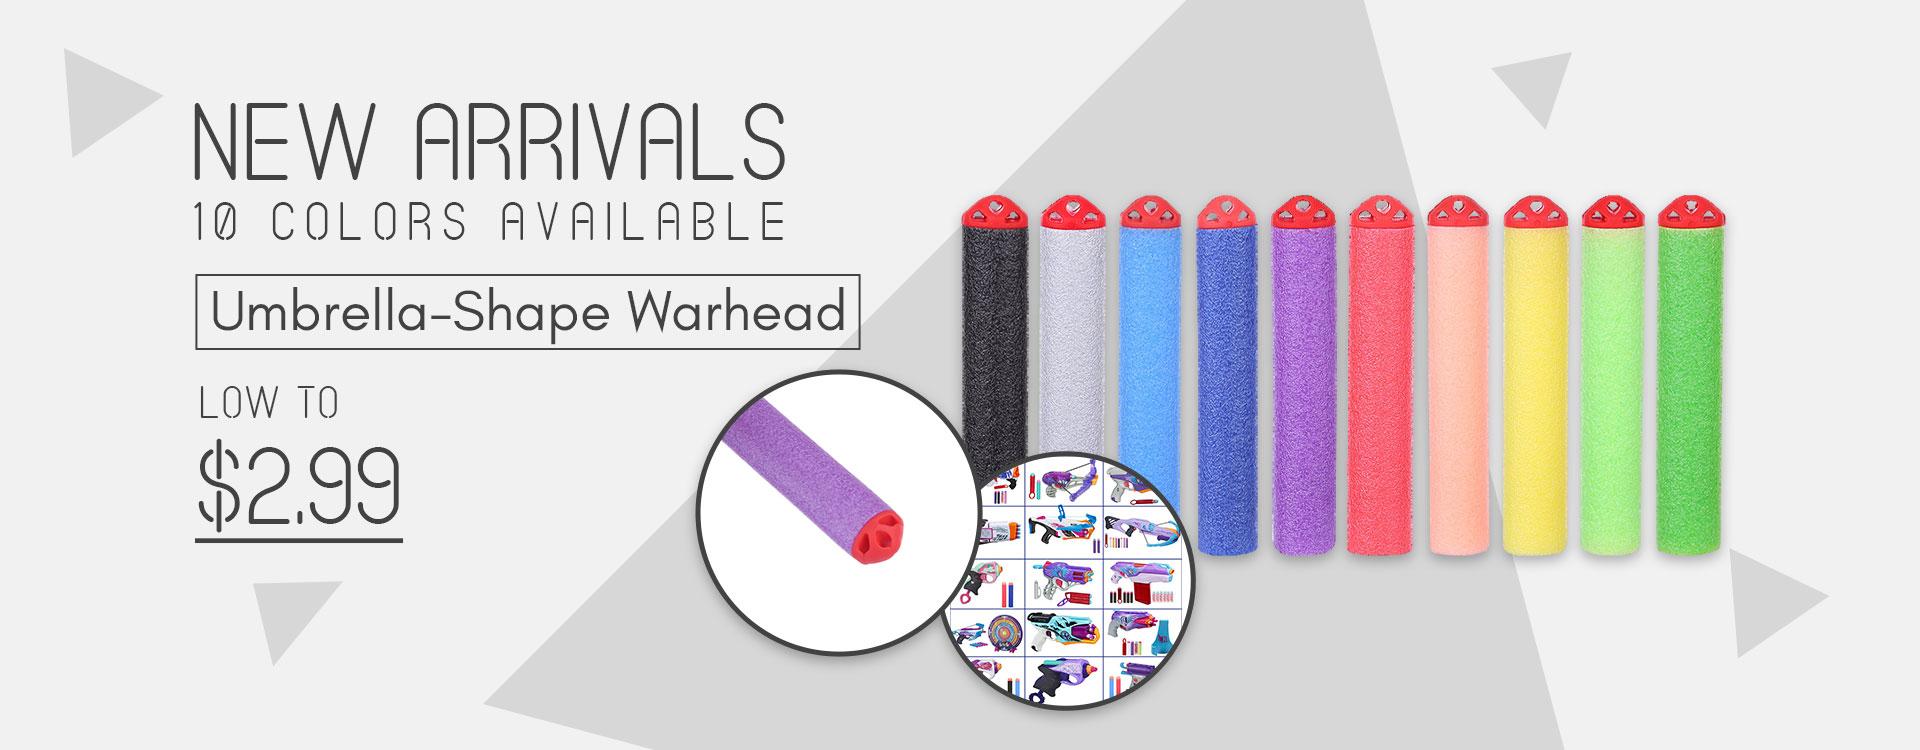 New Arrivals Umberella Shape Warhead